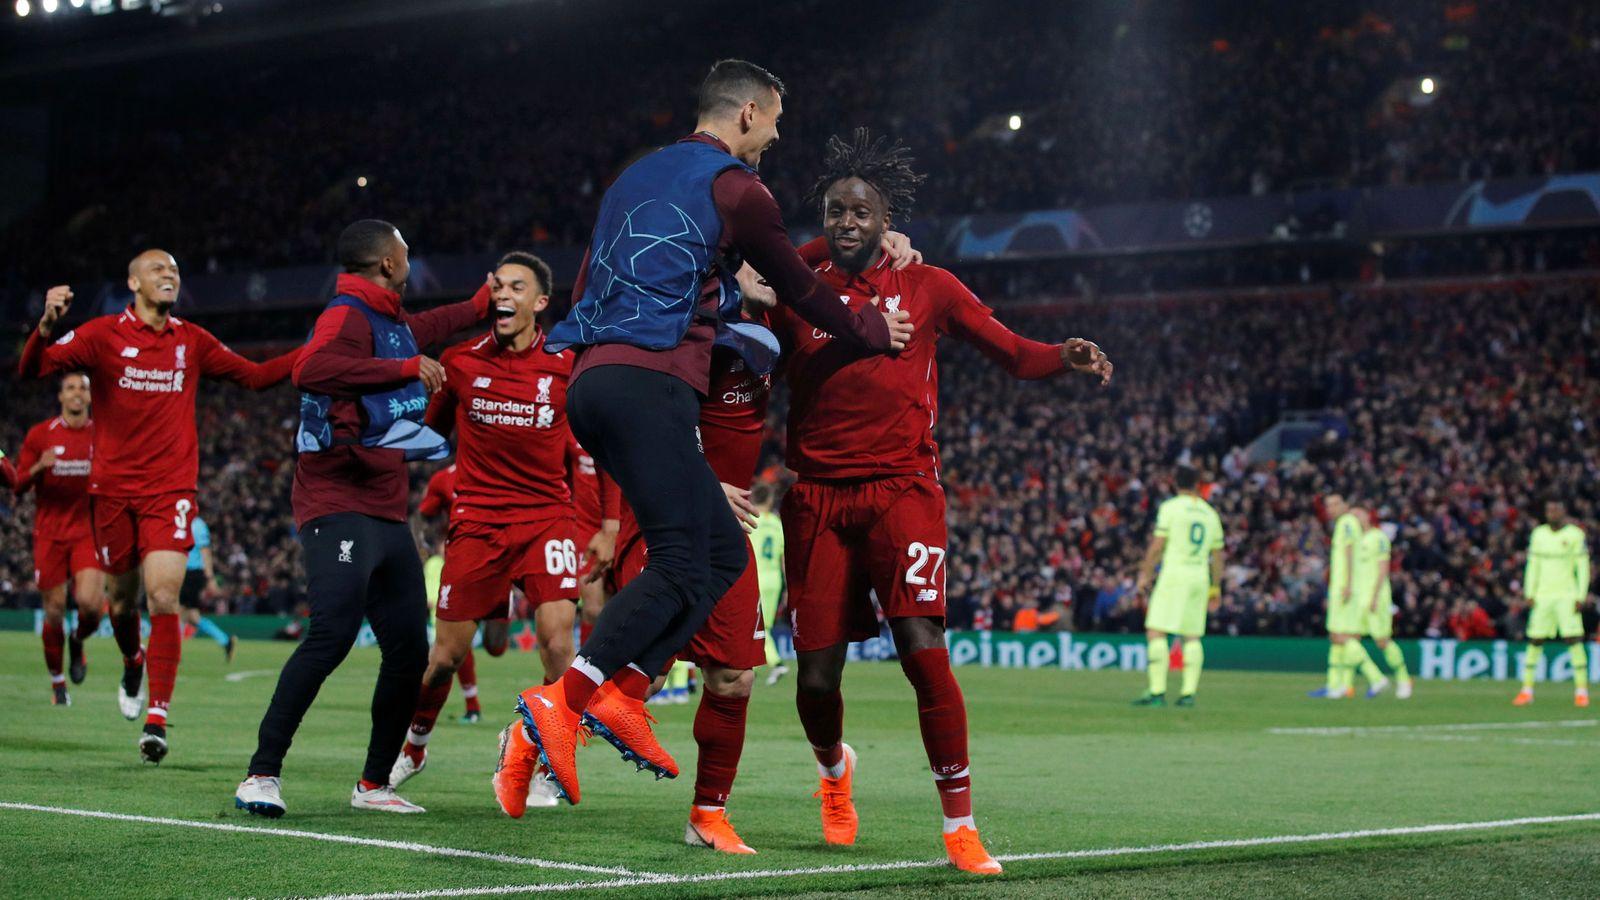 Foto: Champions league semi final second leg - liverpool v fc barcelona